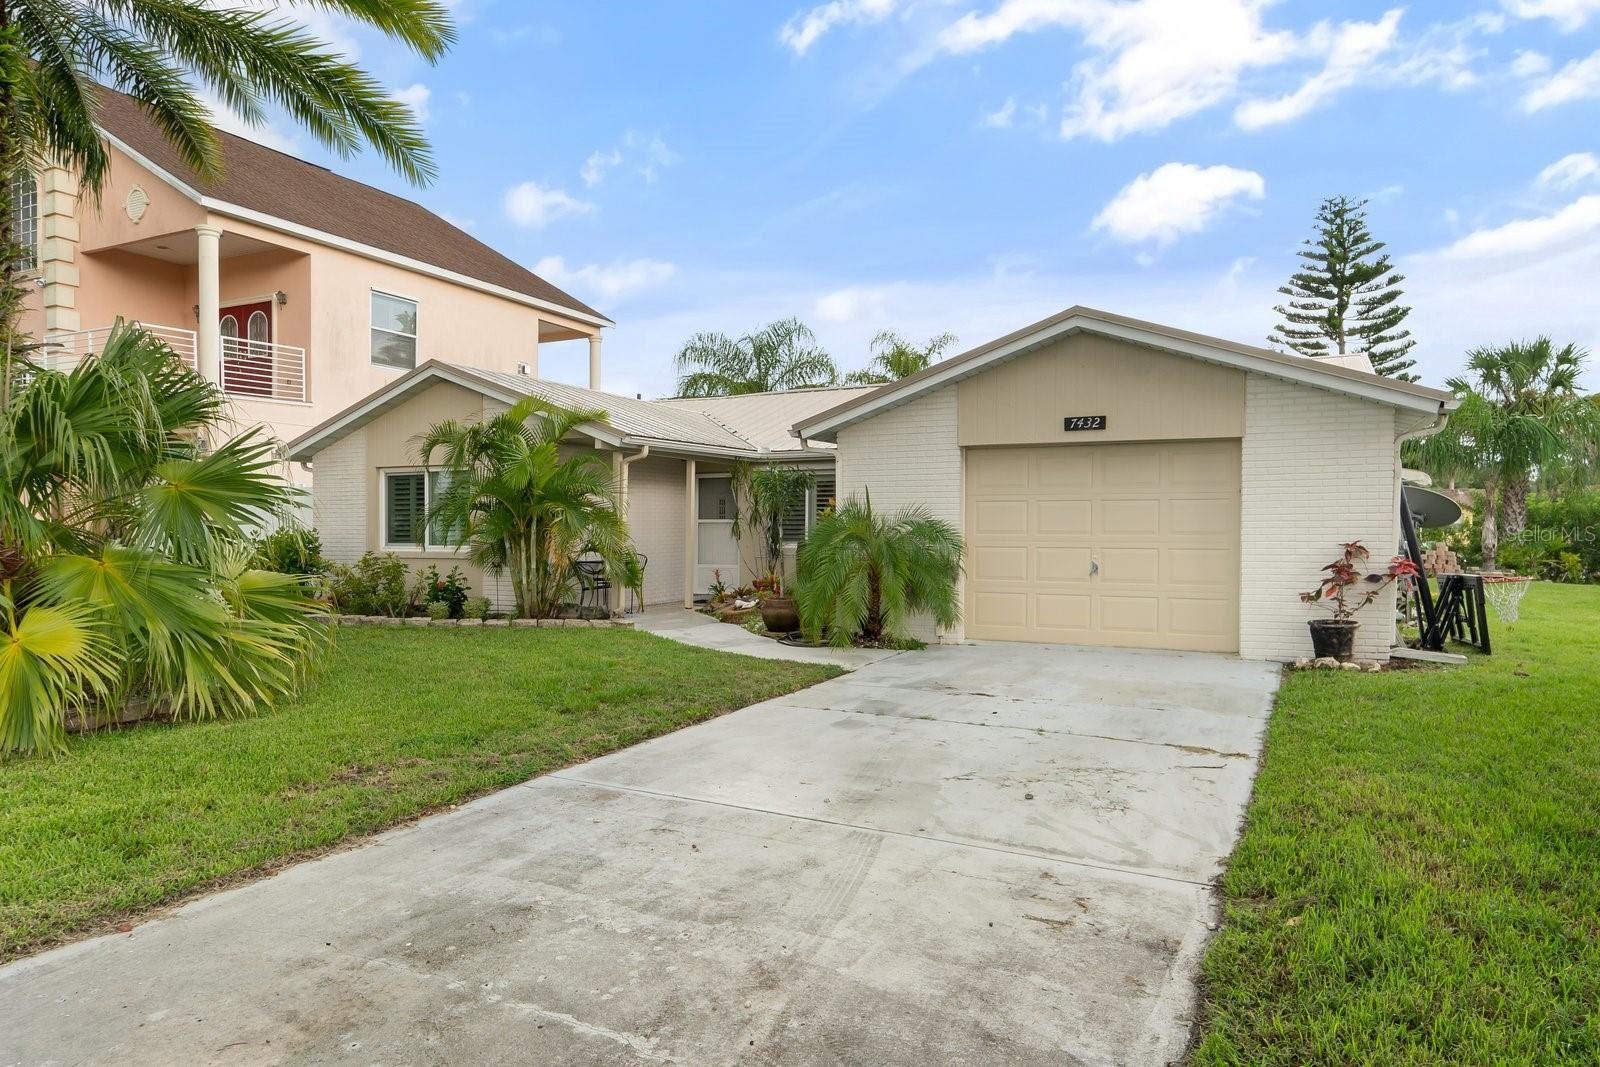 7432 ISLANDER LANE, Hudson, FL 34667 - MLS#: W7836403